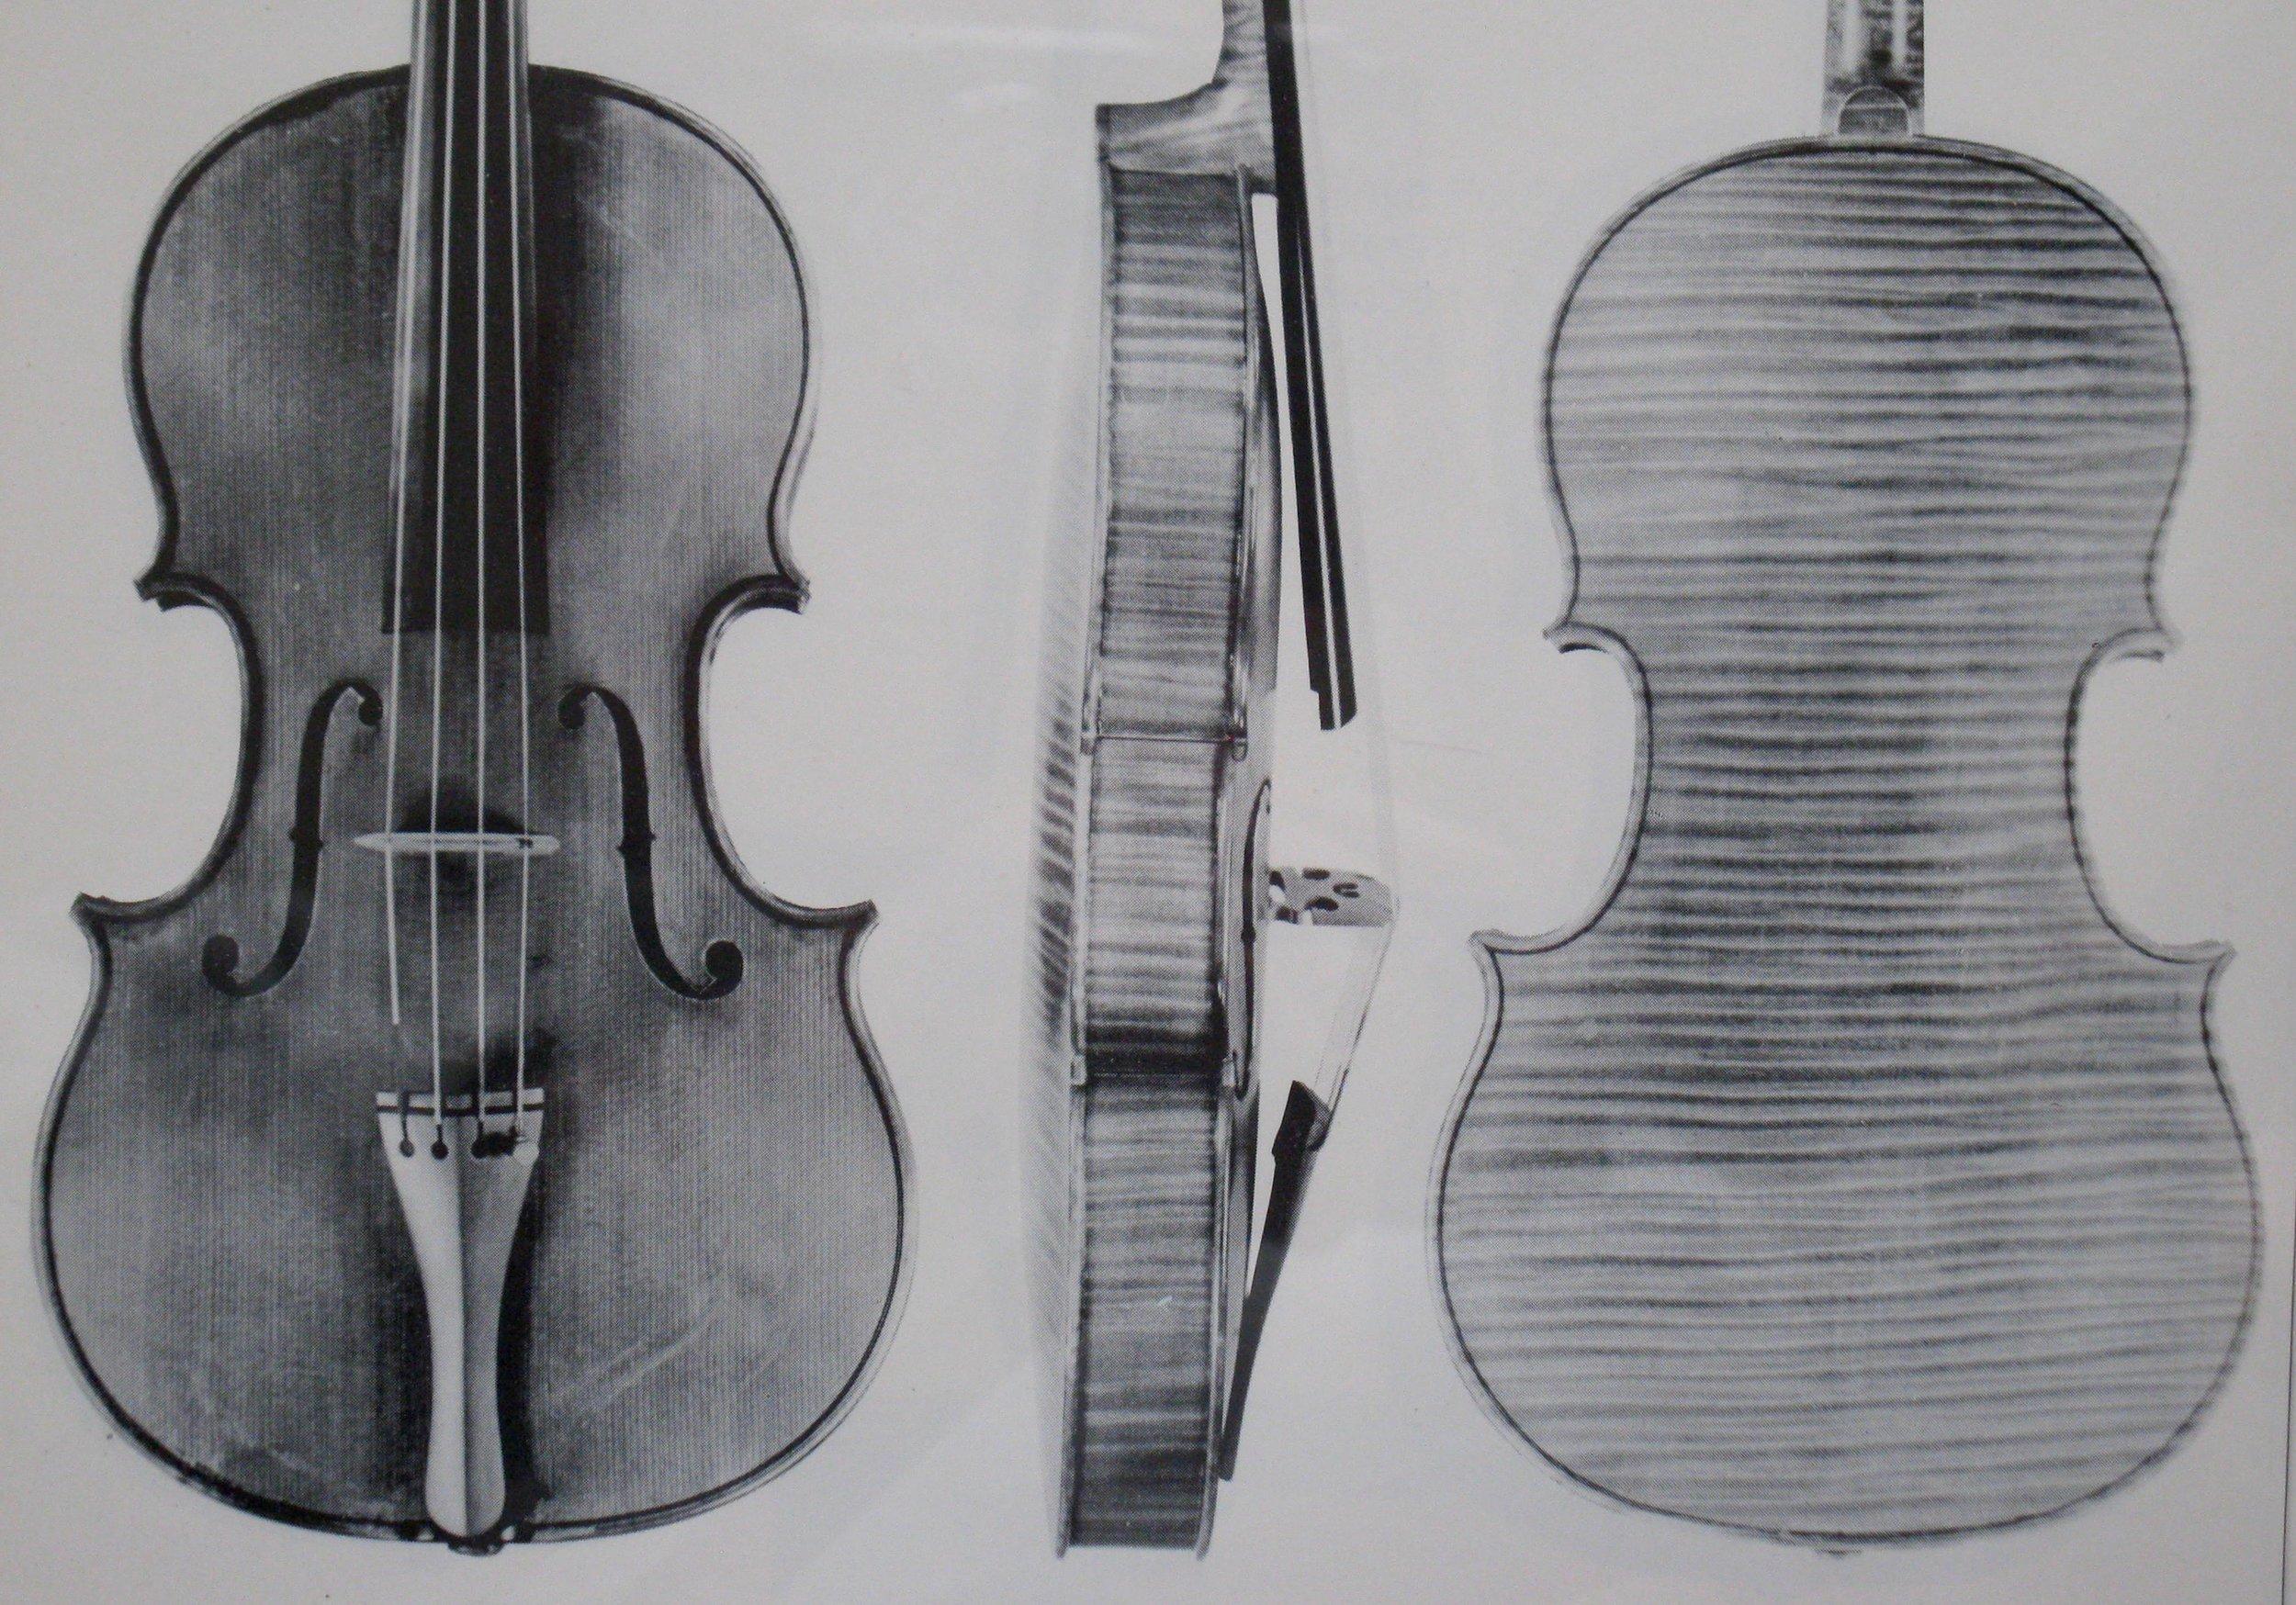 McKean viola in catalog